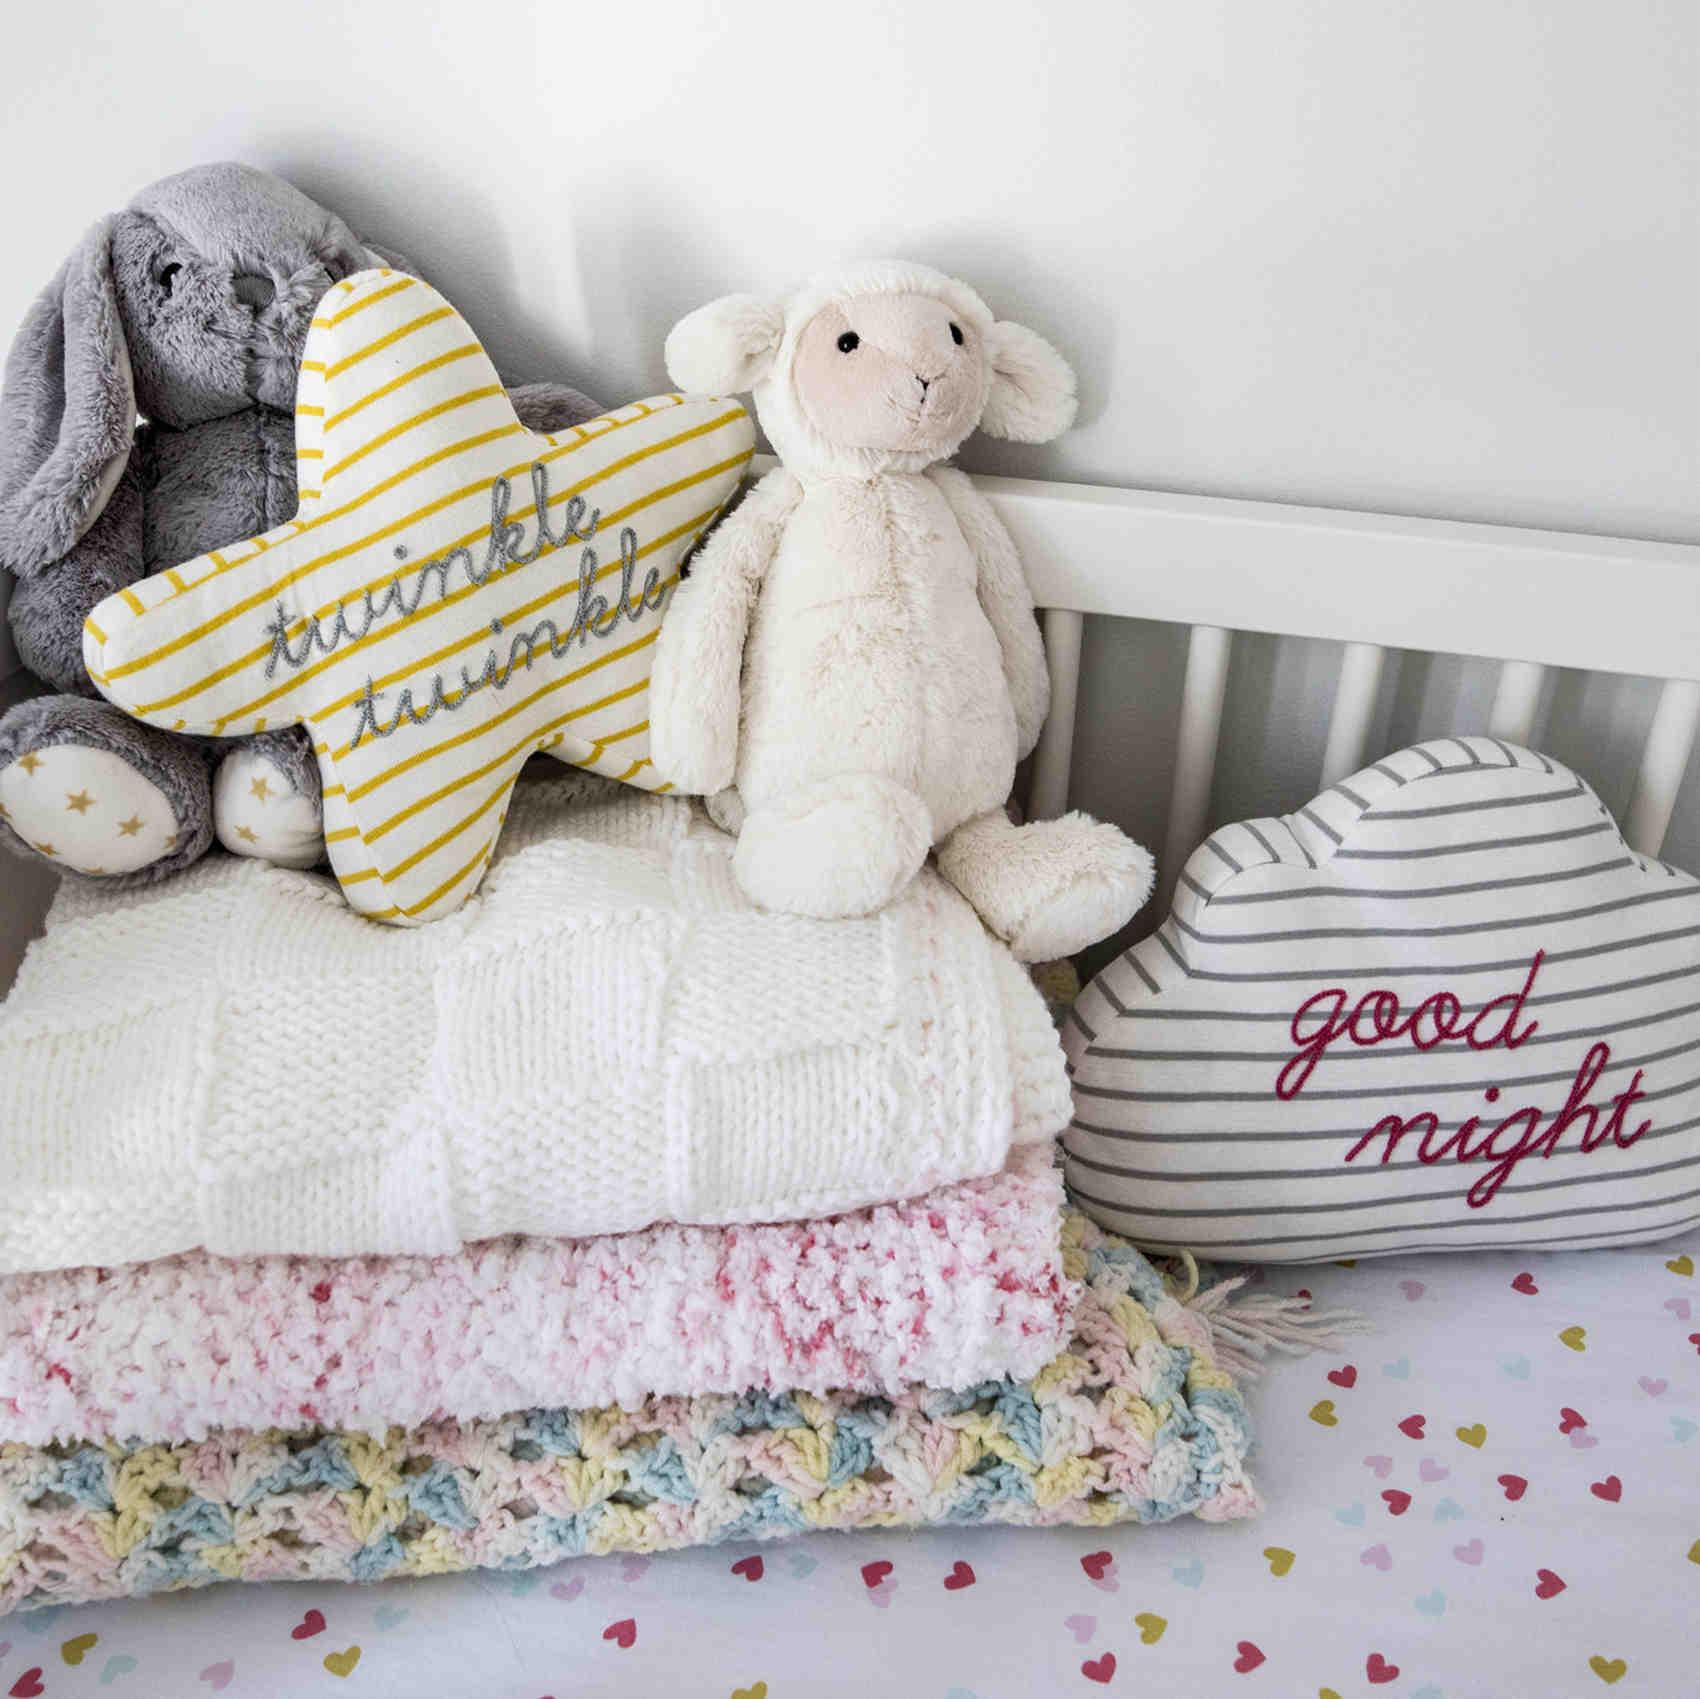 Nursery Handmade Ideas: The Handmade Baby Gifts For Angelique Cabral's Nursery